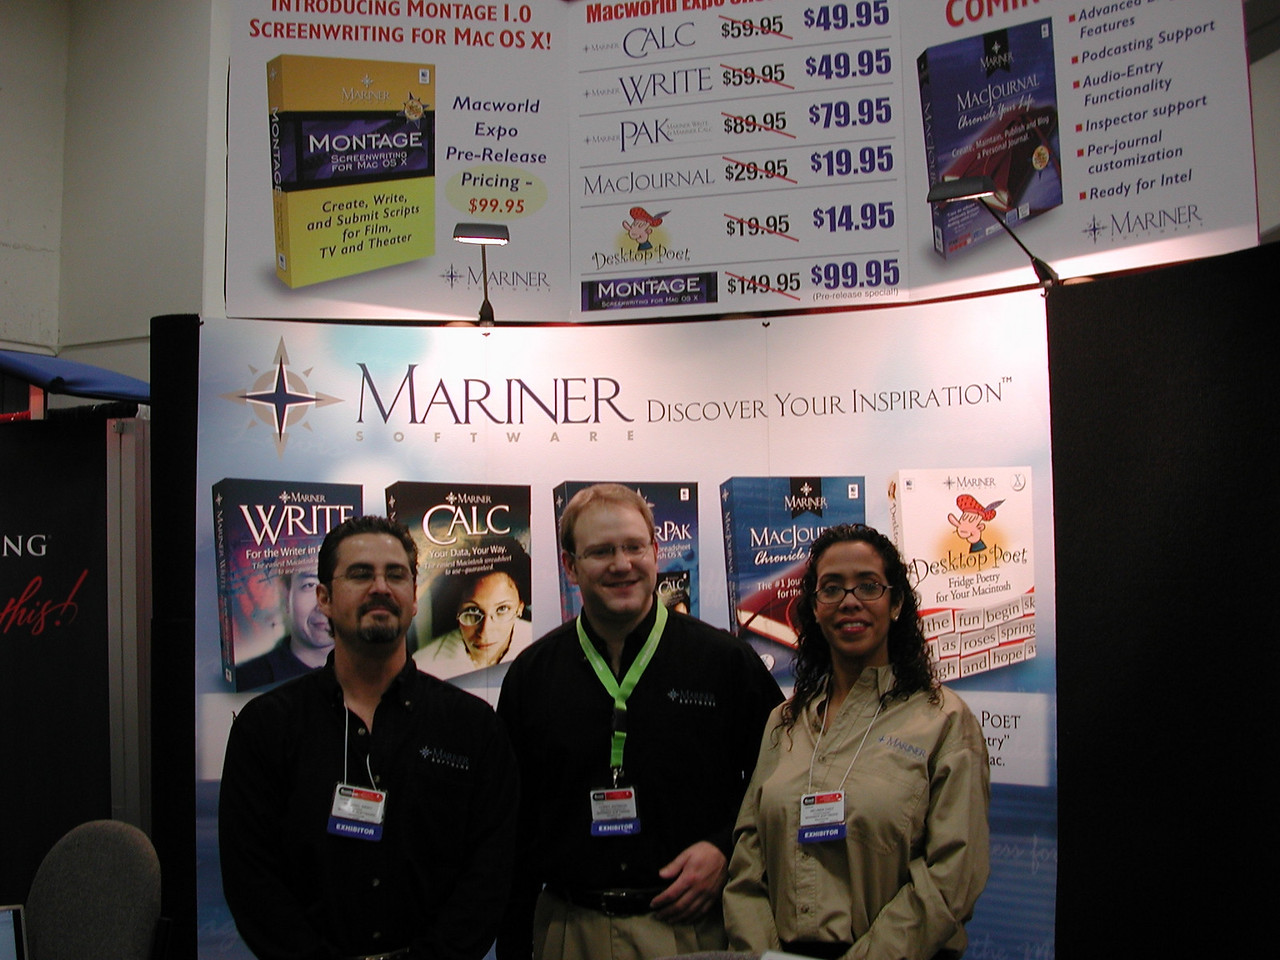 Mariner Software crew.